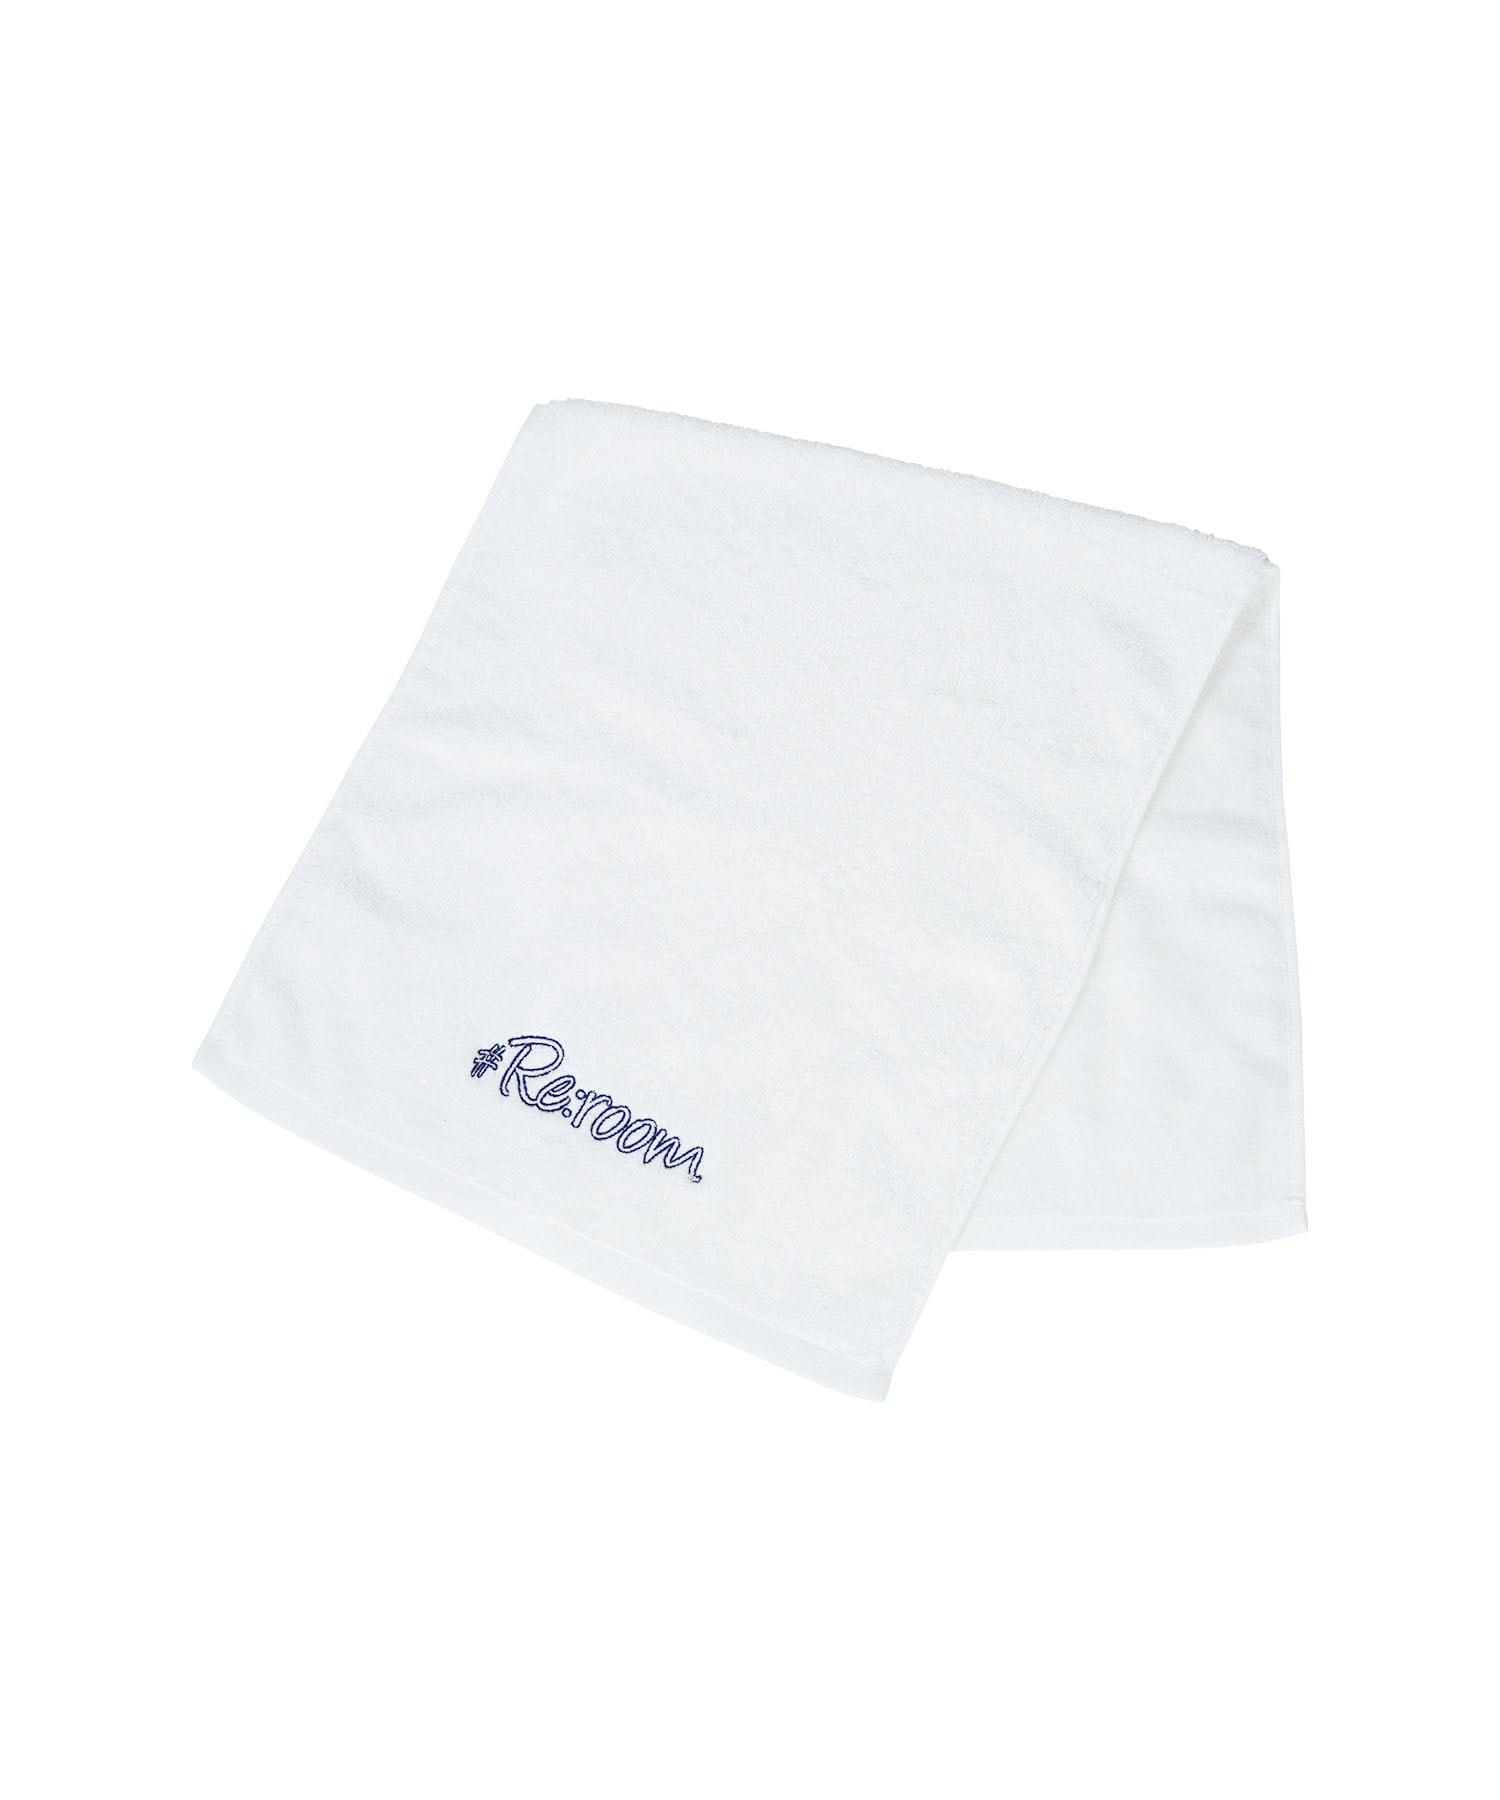 LOGO FRAME EMBROIDERY FACE TOWEL[REG127]